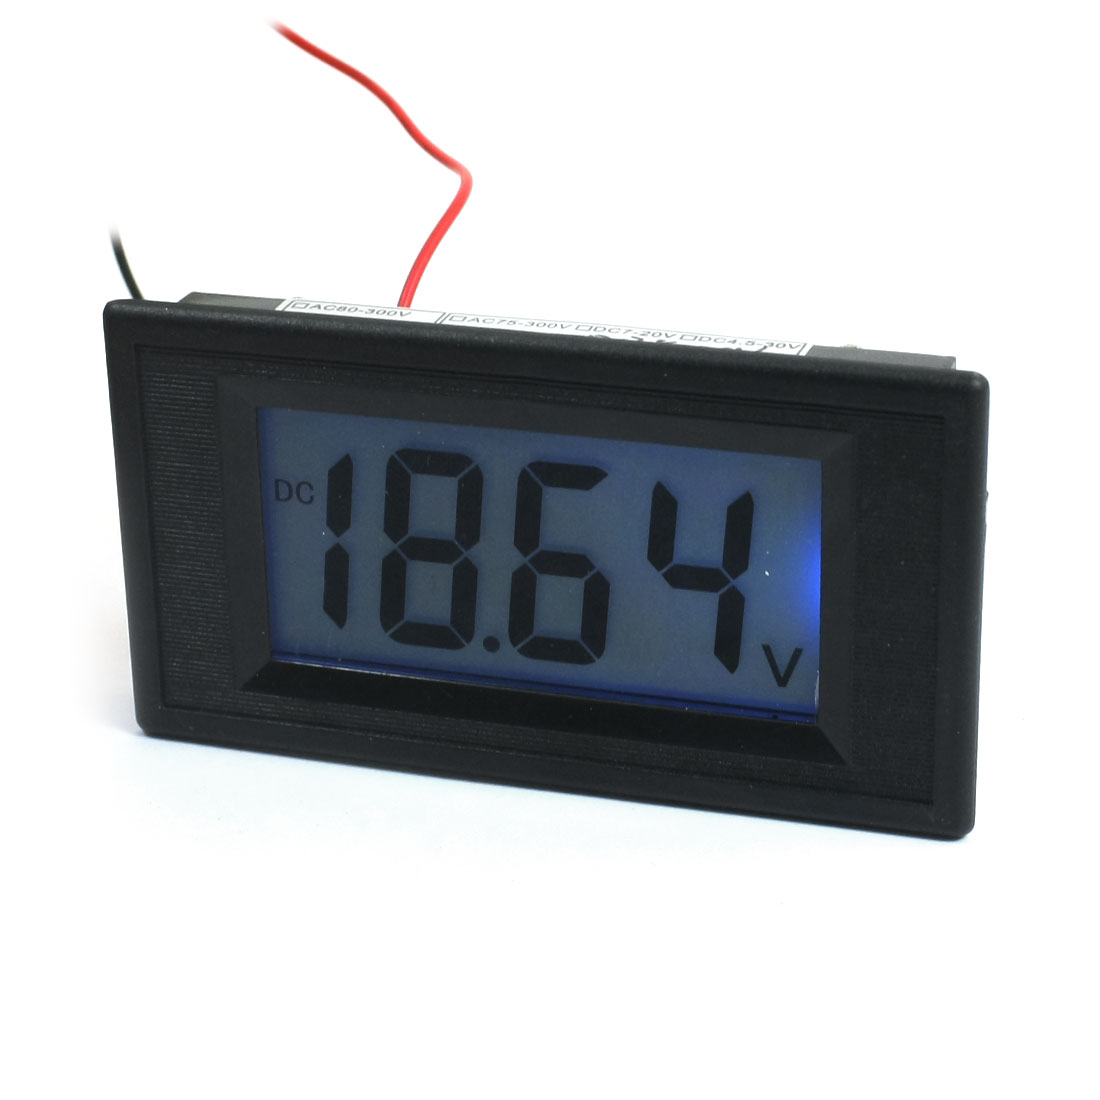 DC 3.5-20V Blue LCD Digital Volt 14cm Long 2 Wire Voltmeter YB5135D